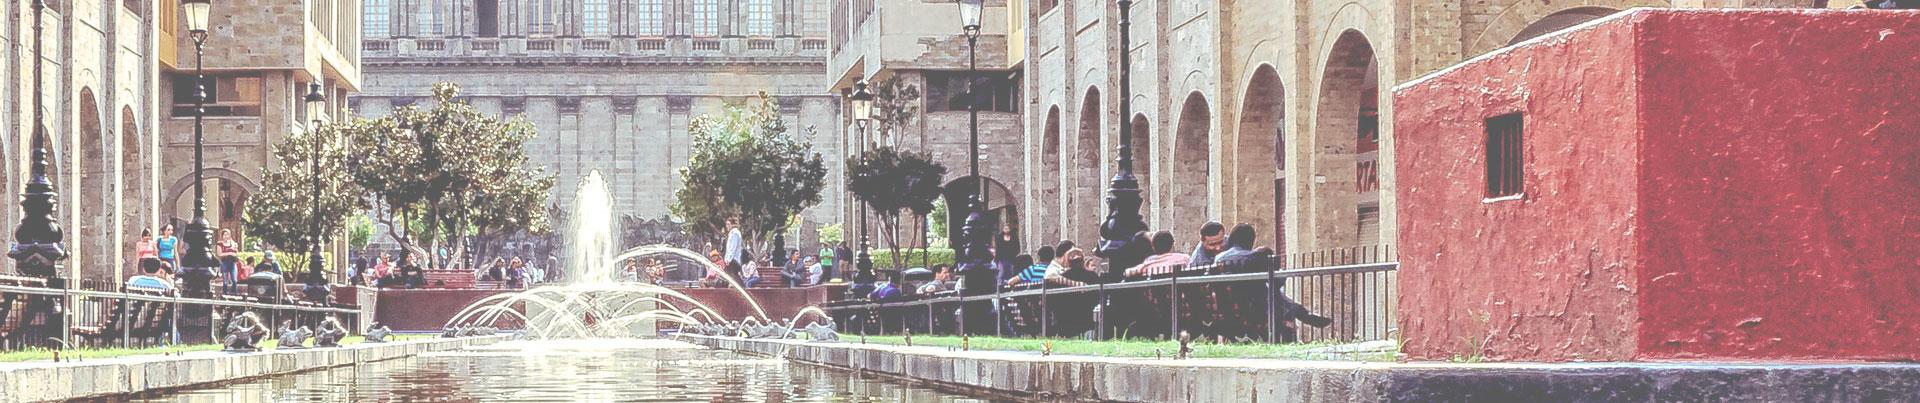 Weight Loss Surgery in Guadalajara - Freedom Bariatrics